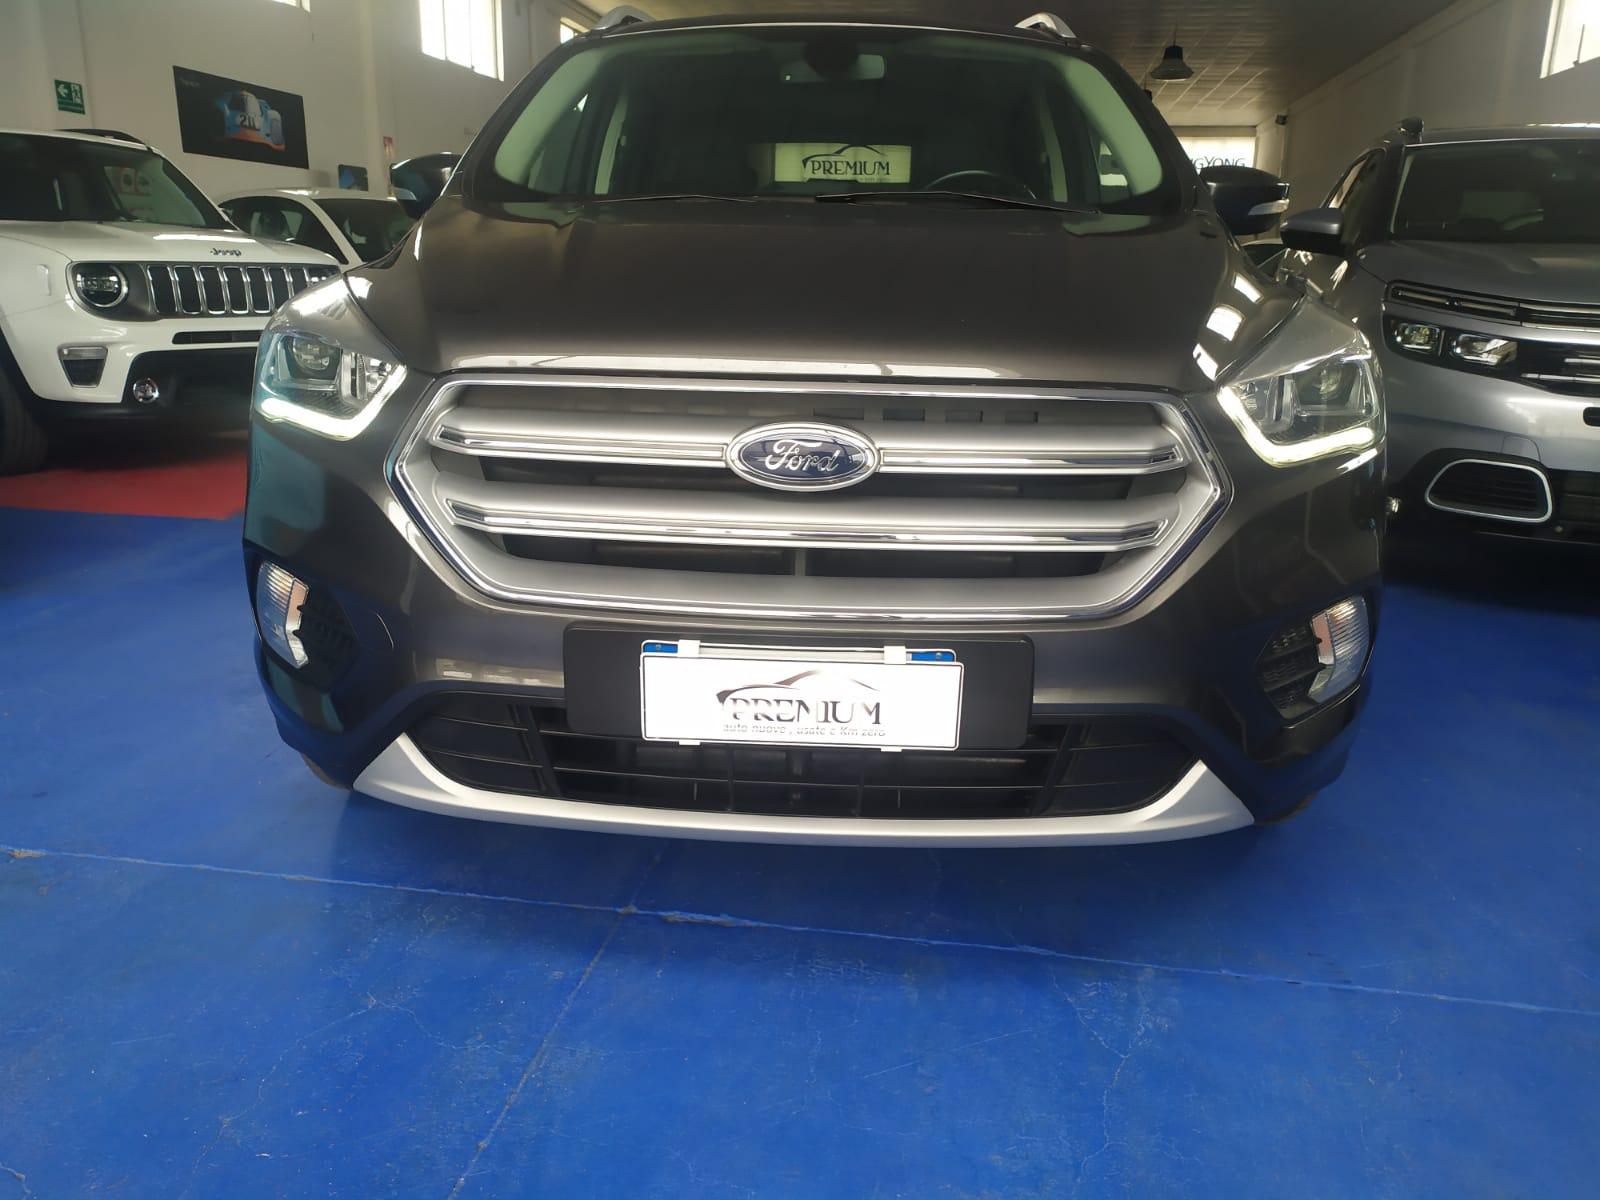 Ford_Kuga I